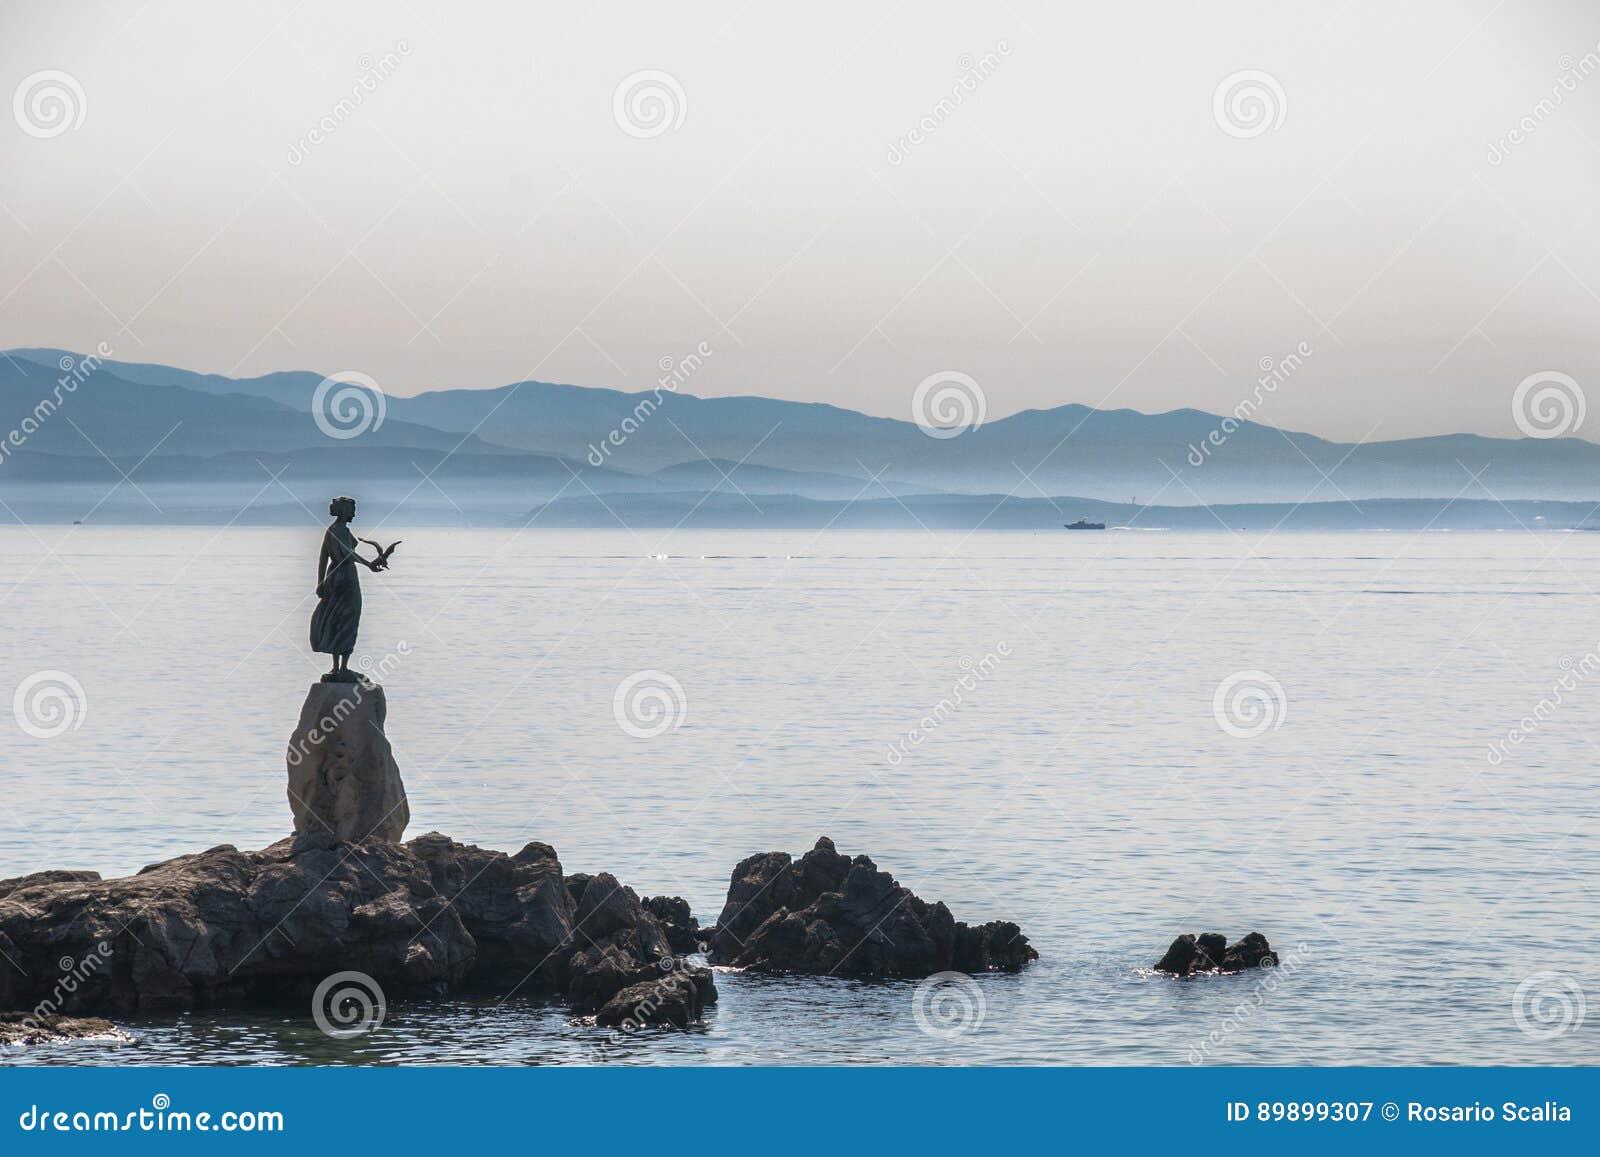 Croacia Opatija la muchacha con la gaviota